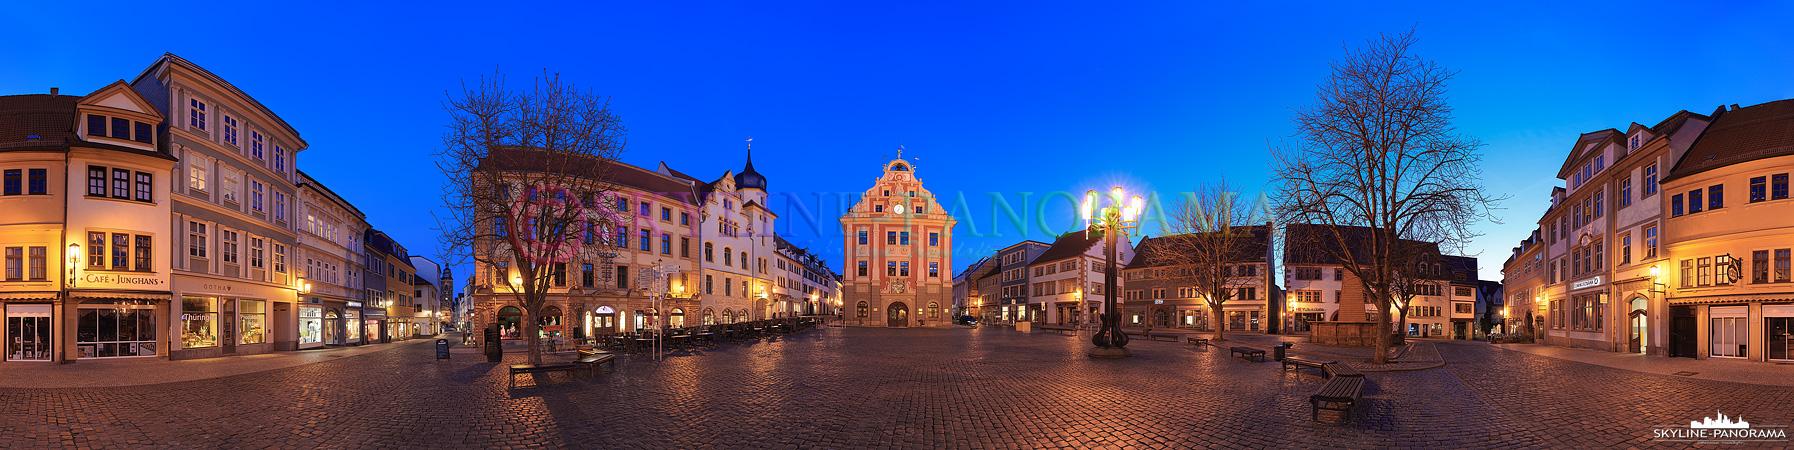 Panorama Gotha - Rathaus